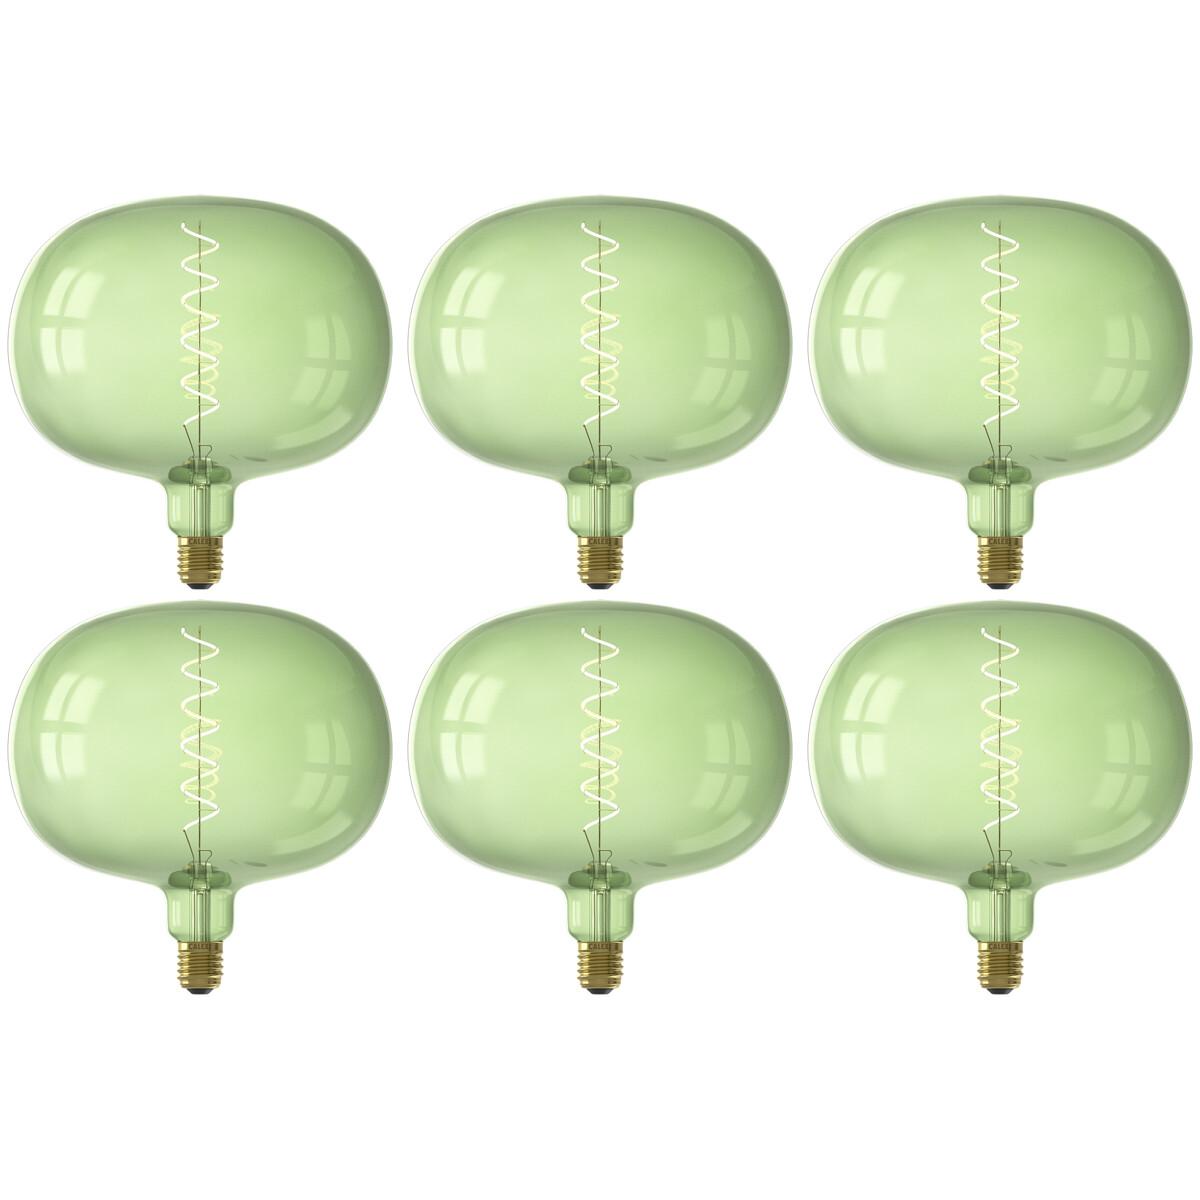 CALEX - LED Lamp 6 Pack - Boden Emerald - E27 Fitting - Dimbaar - 4W - Warm Wit 2200K - Groen